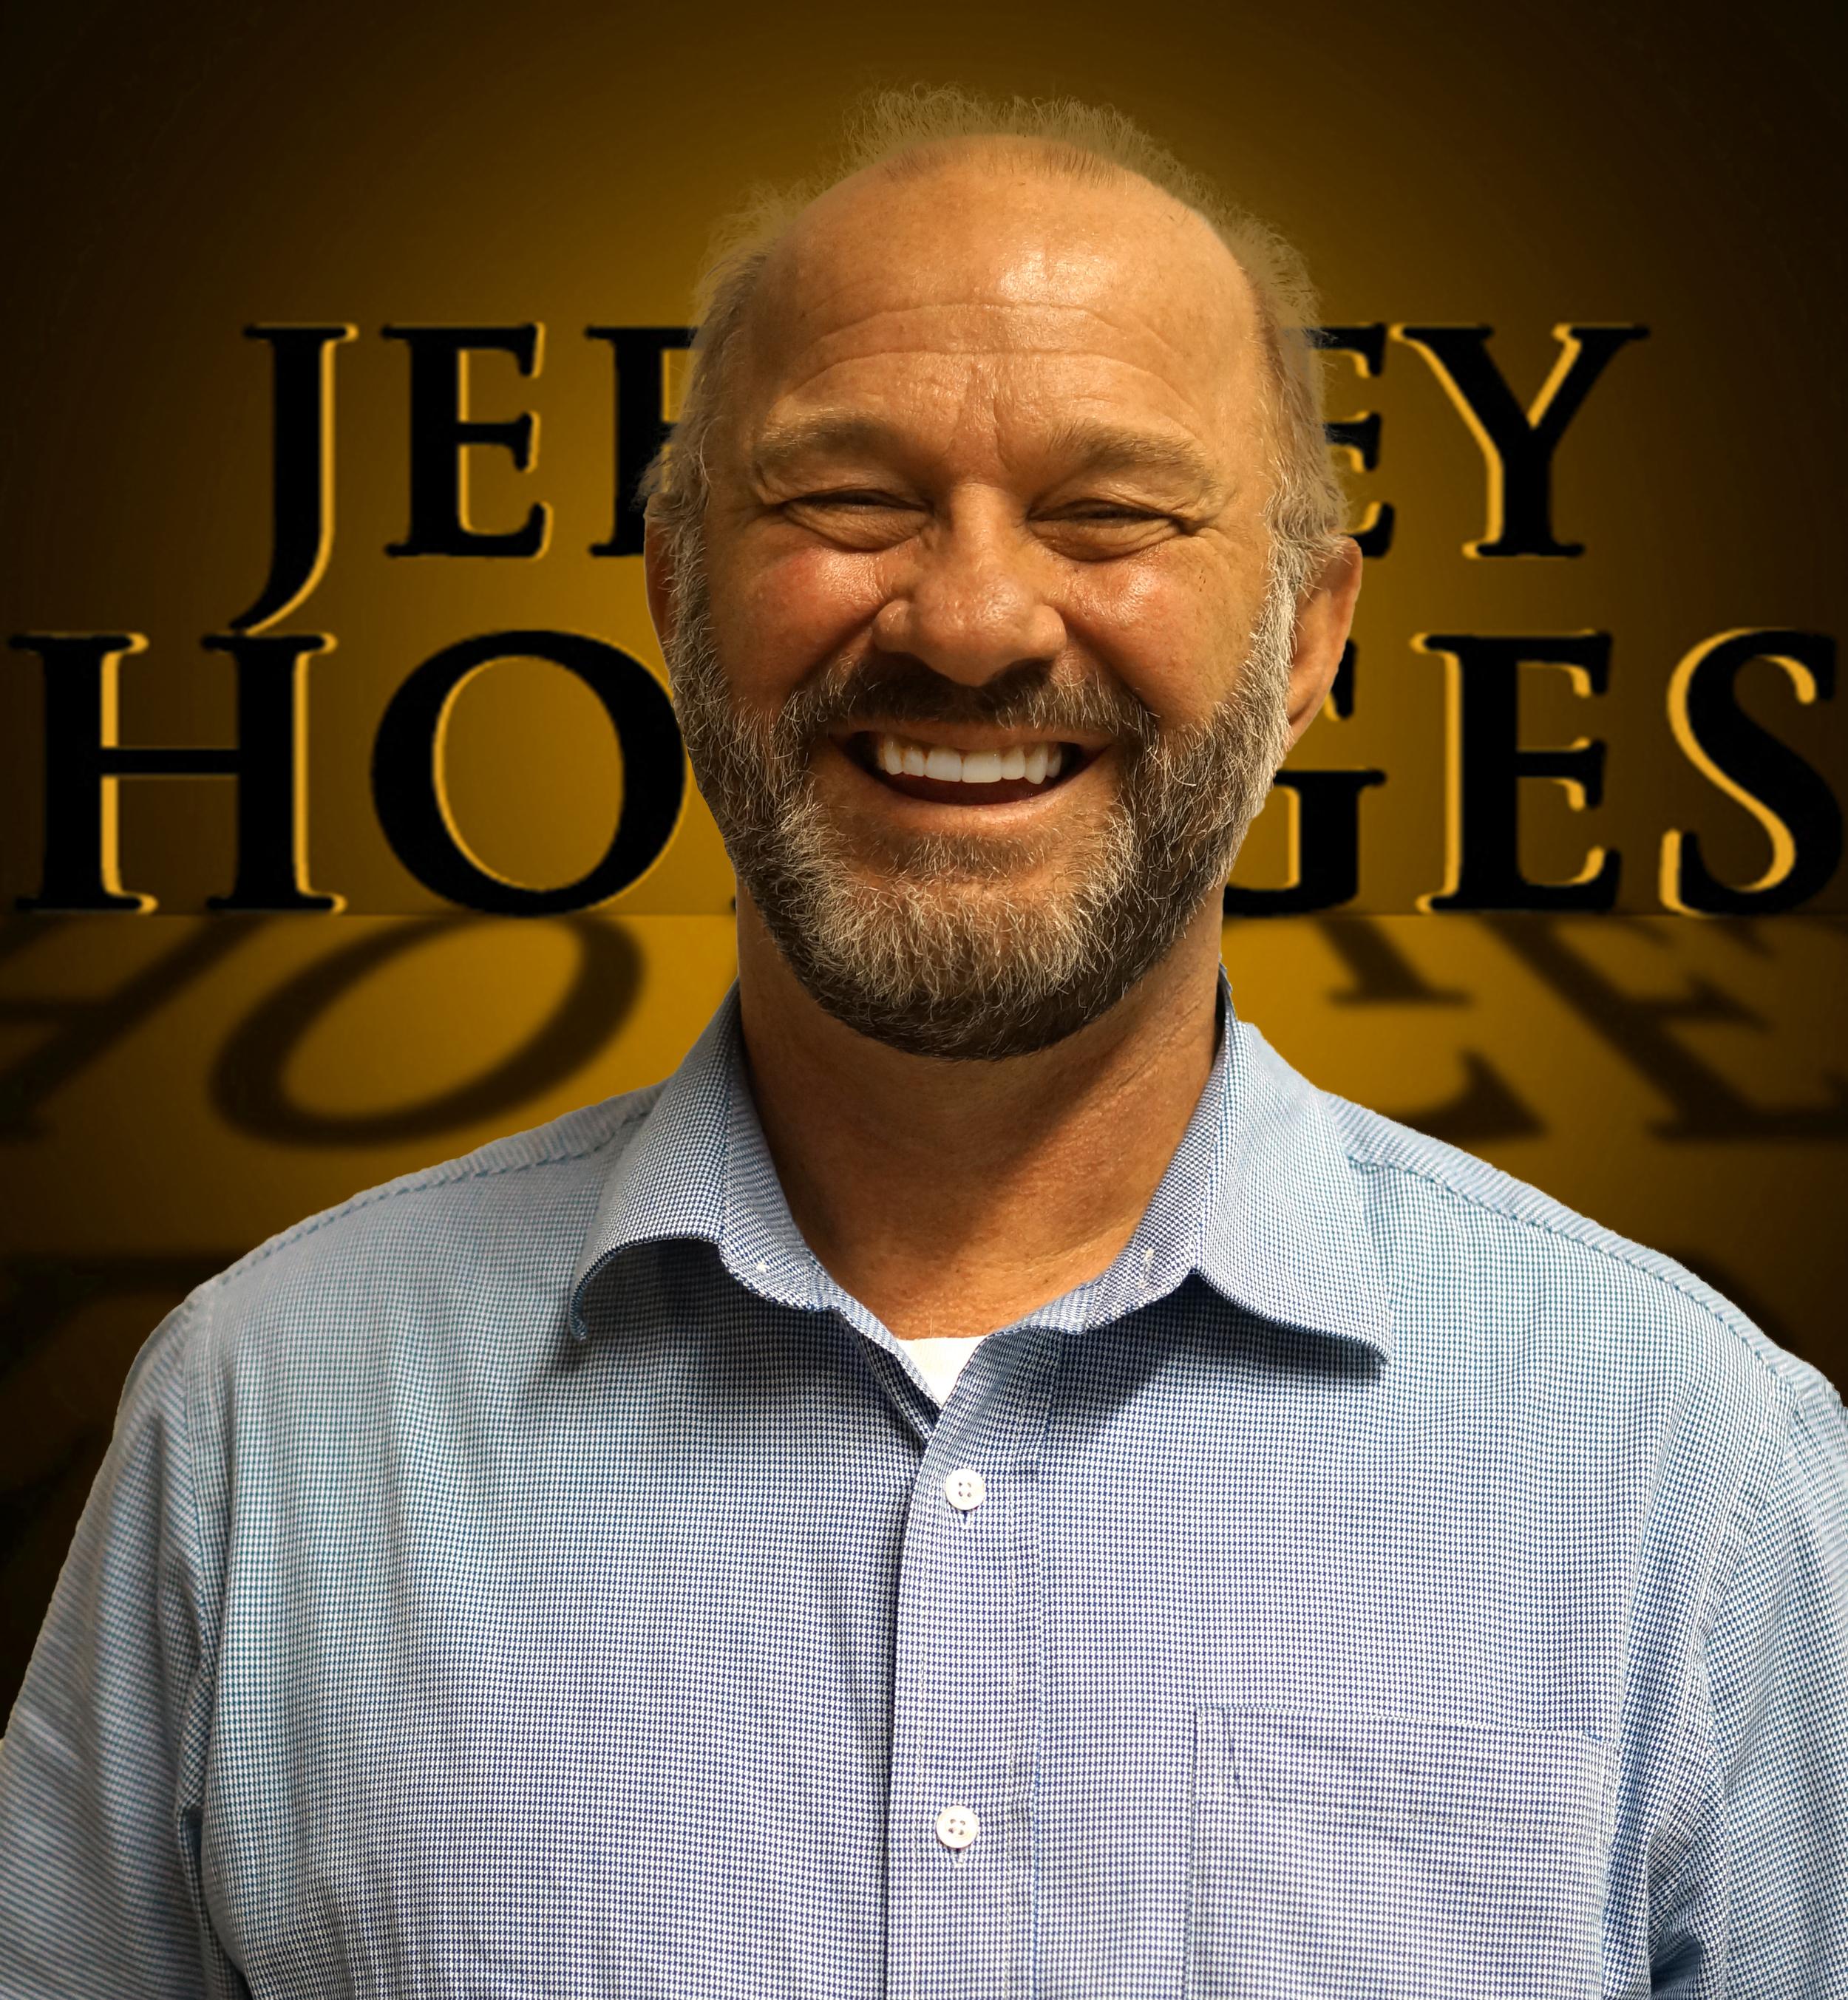 Jeffrey Alan Hodges